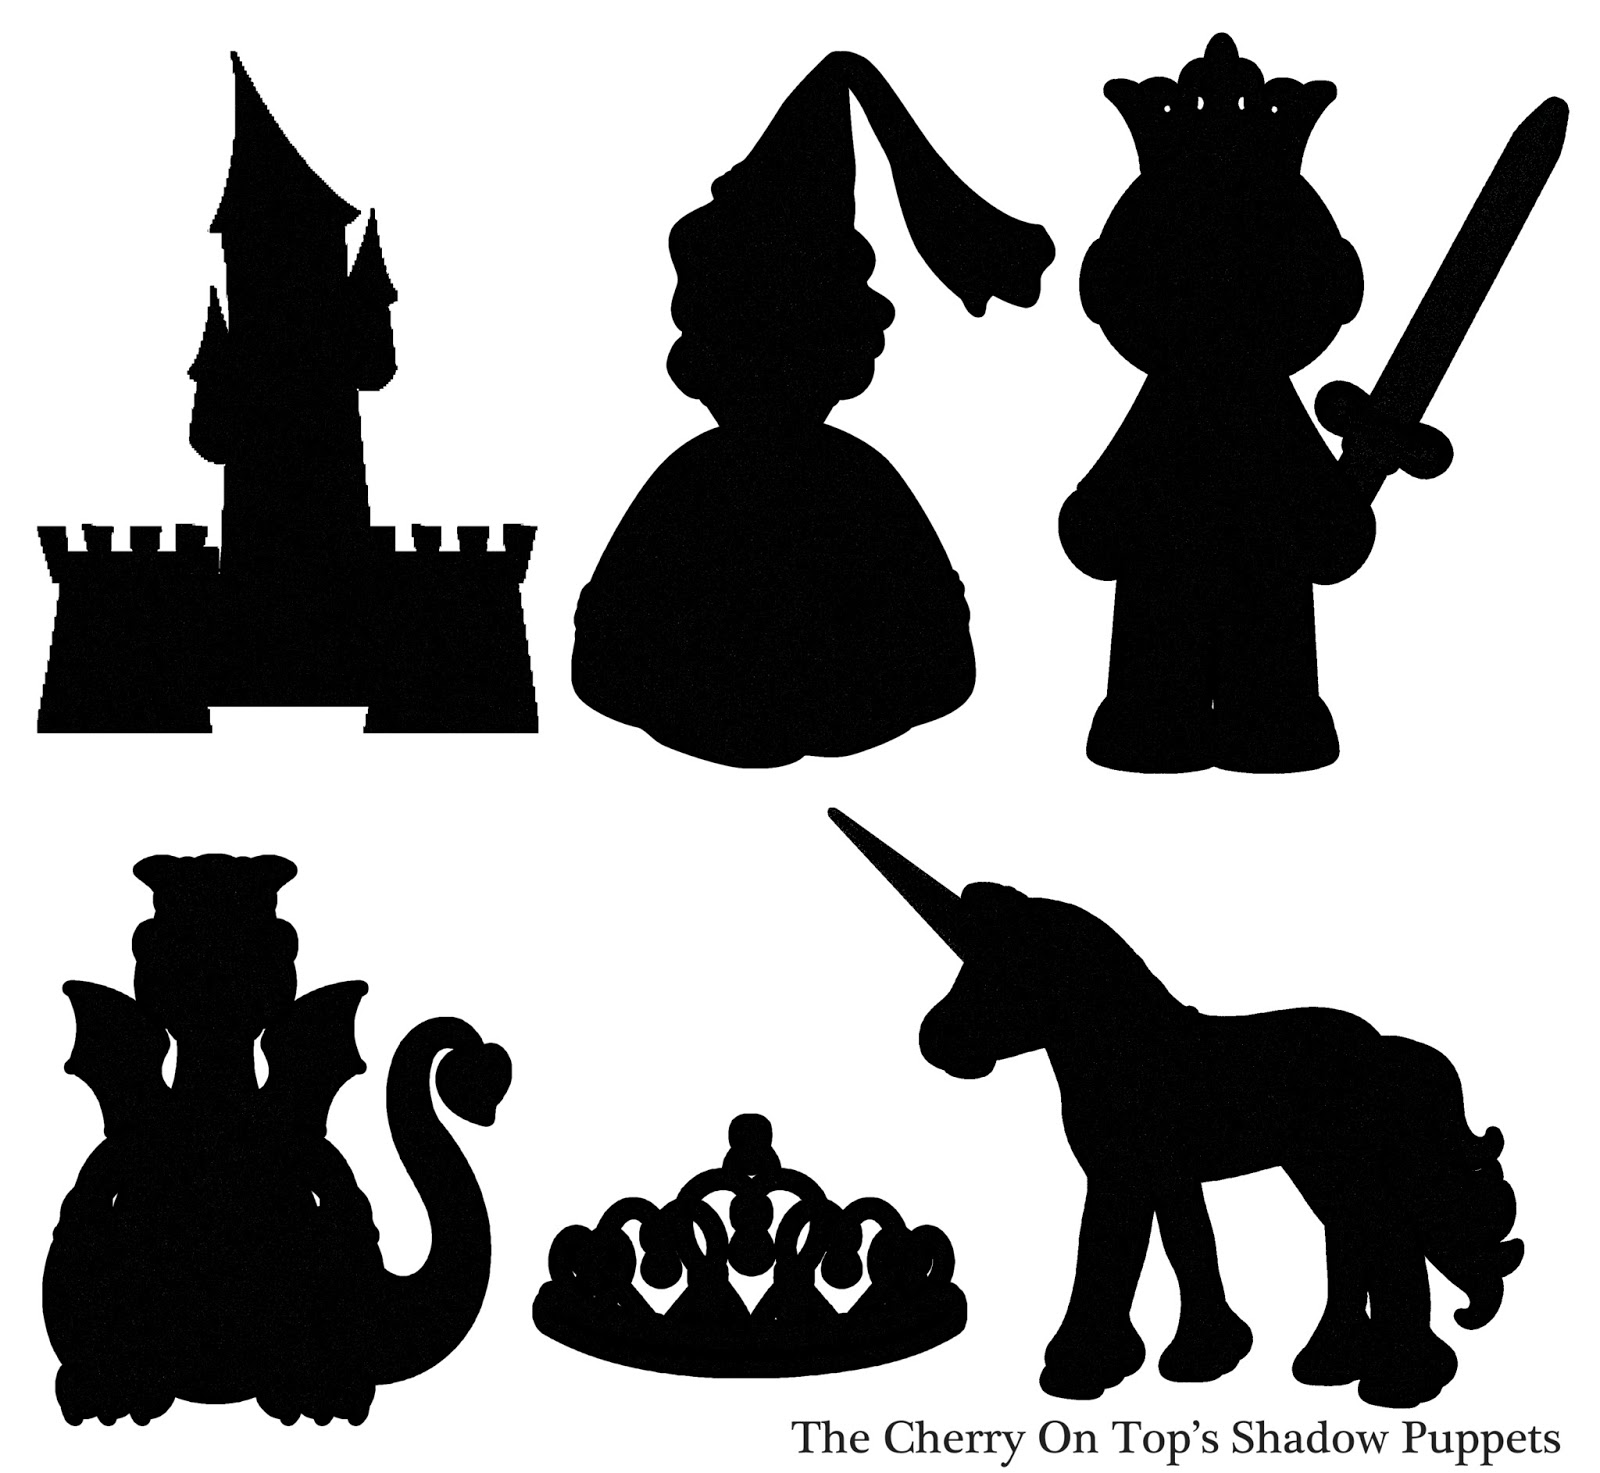 photograph regarding Printable Shadow Puppets titled shadow puppet templates printable